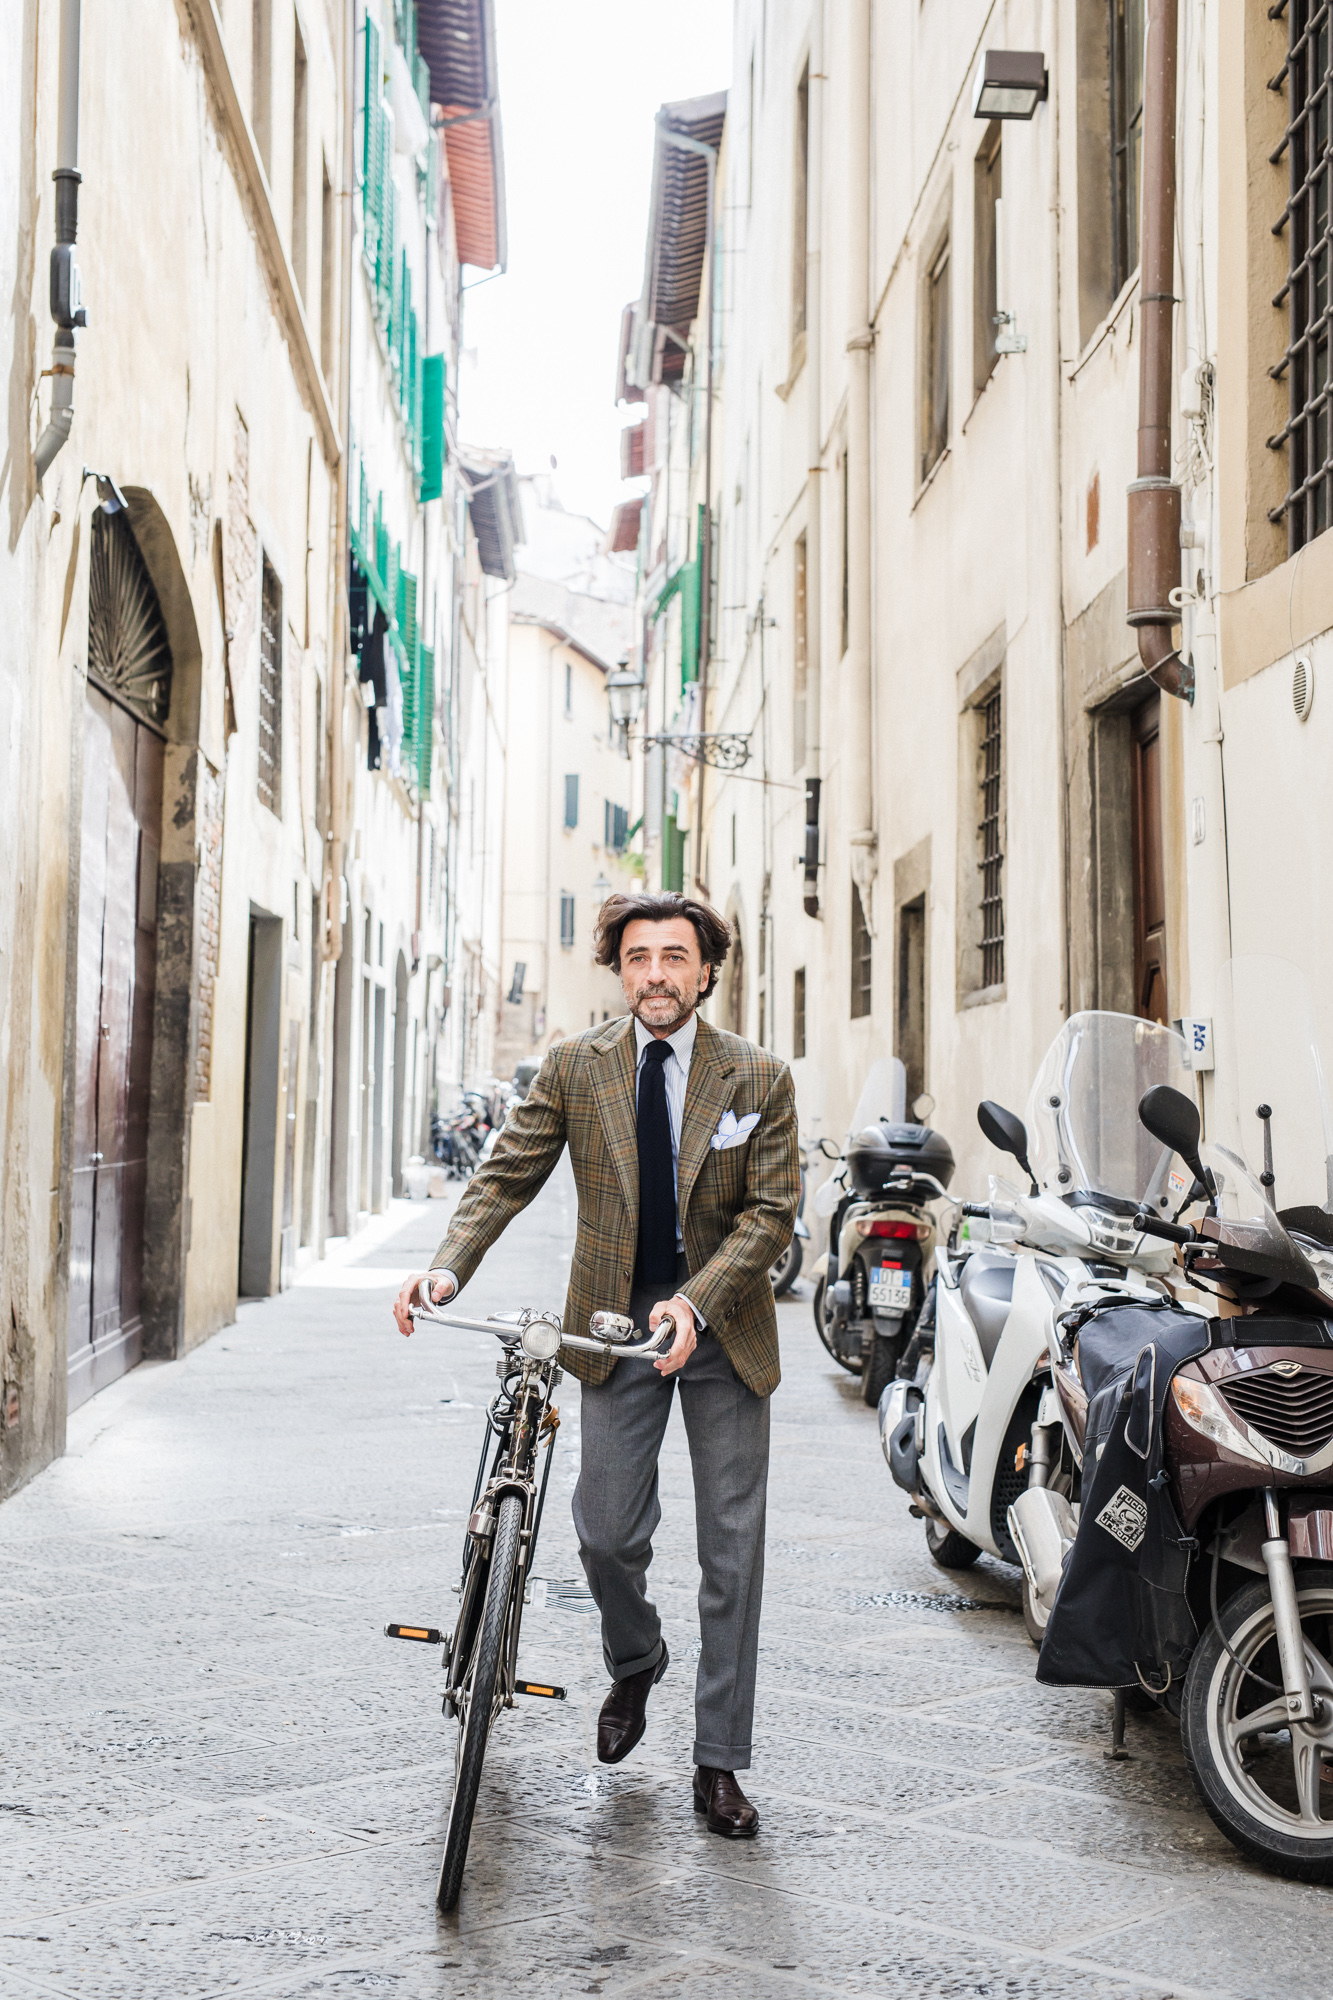 Sartoria Vestrucci model with bike